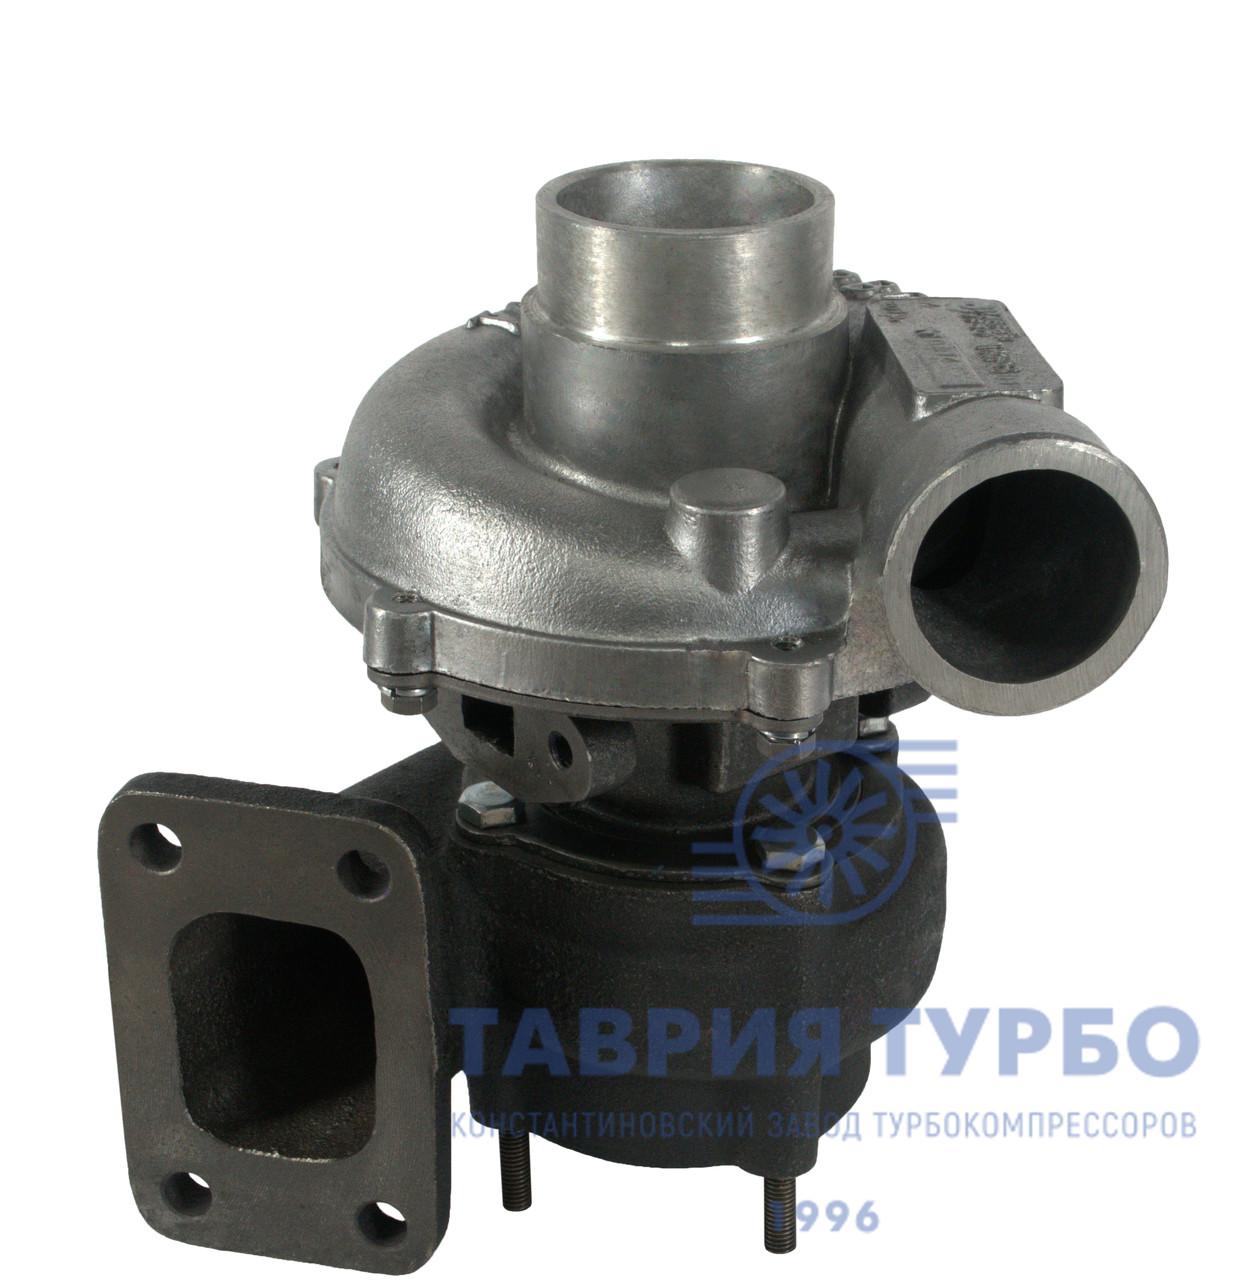 Турбокомпрессор ТКР 6-07 , Турбина на Тракторы МТЗ-1021; Двигатель Д-245